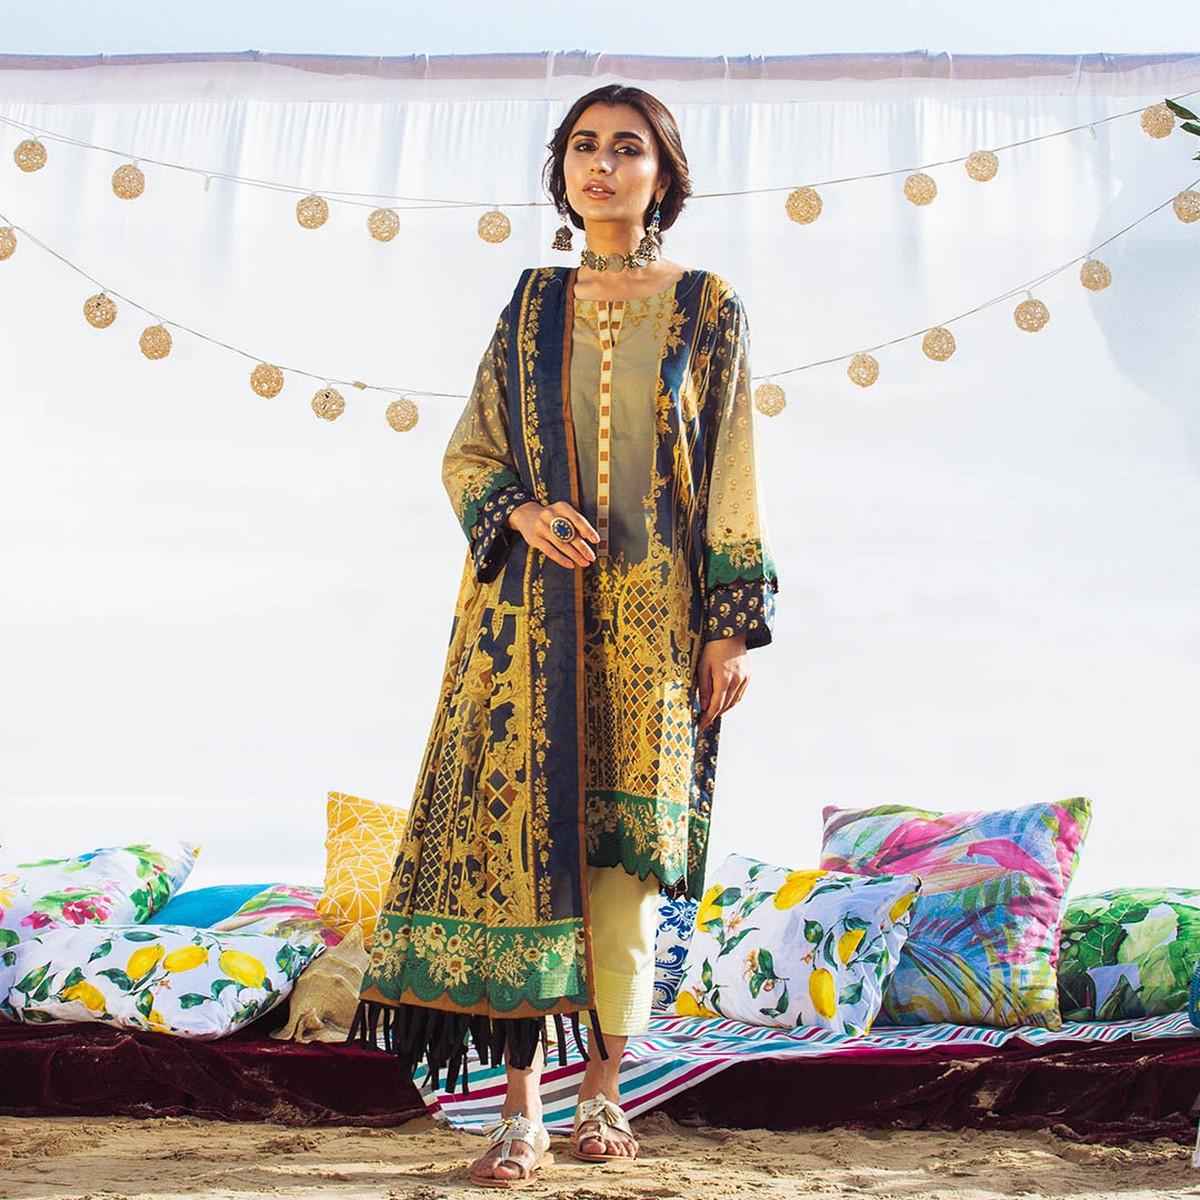 Maahru Beige Castle - Women's Unstitched 3PC Summer Printed Lawn suit with Dupatta